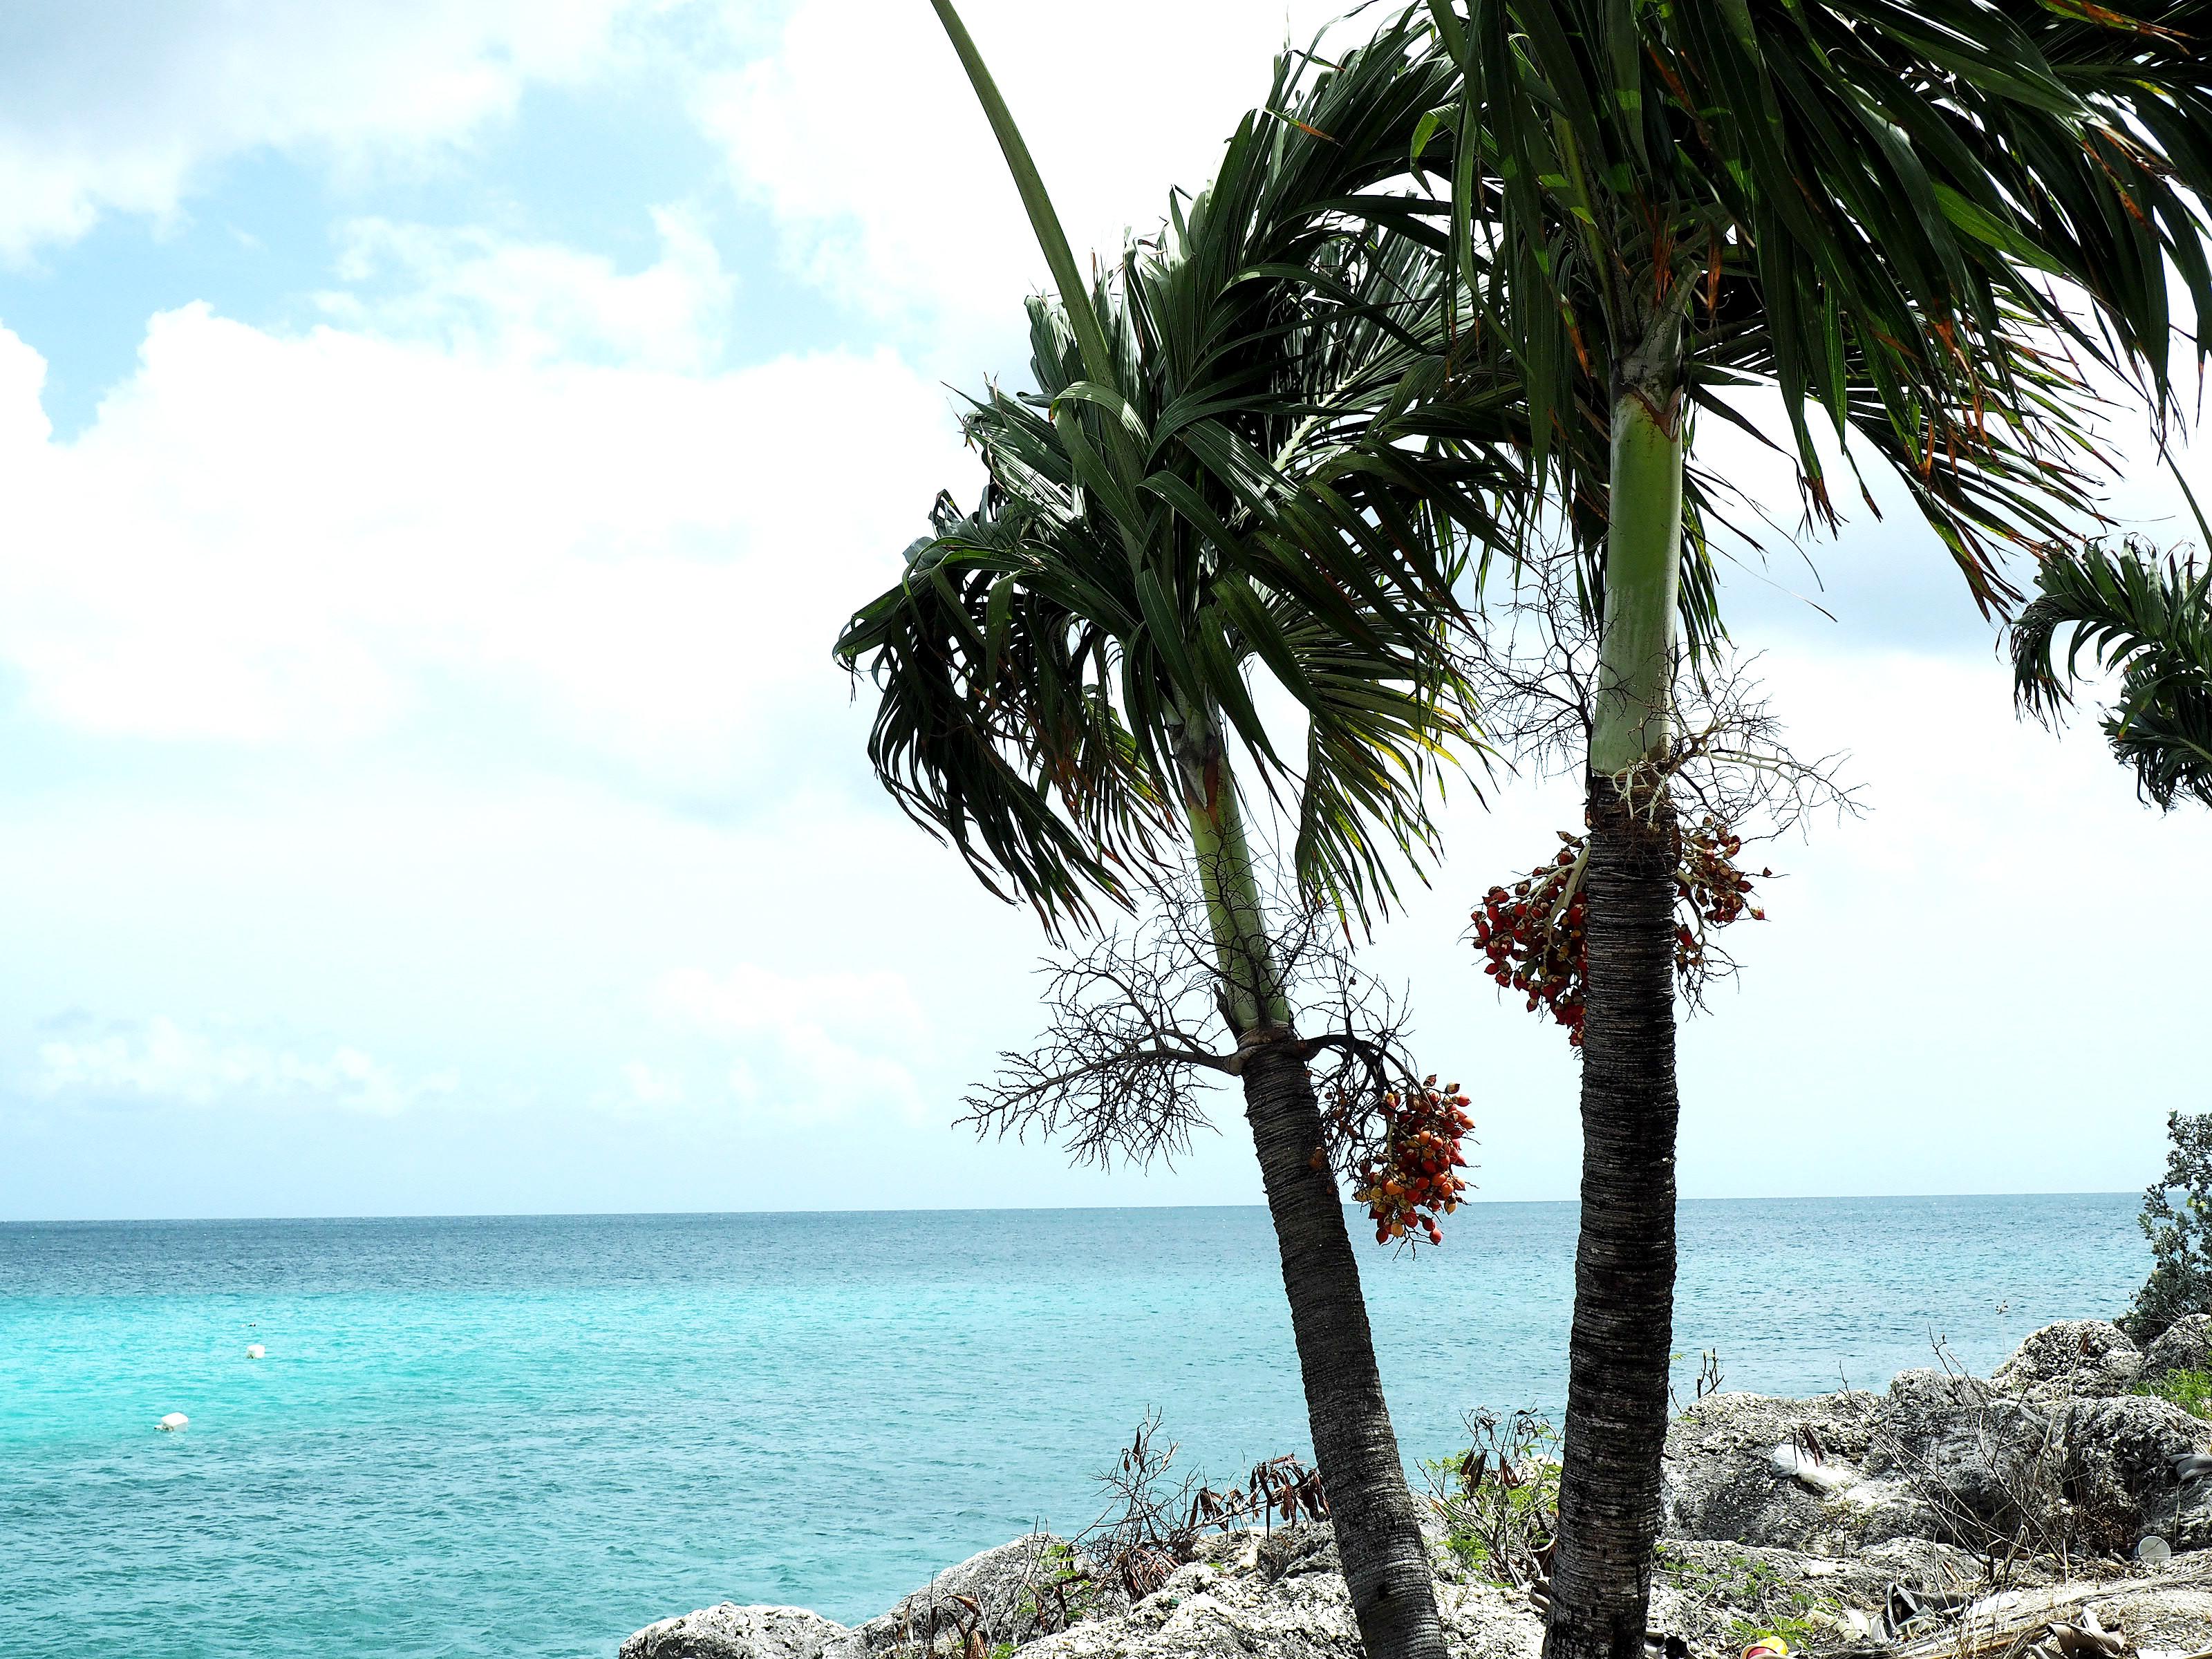 Tommeezjerry-Männerblog-Berlinblog-Fashionblog-Styleblog-Travelblog-Travel-Reiseblog-Reisen-Barbados-Karibik-Carribean-Summer-Sommer-Vacation-9